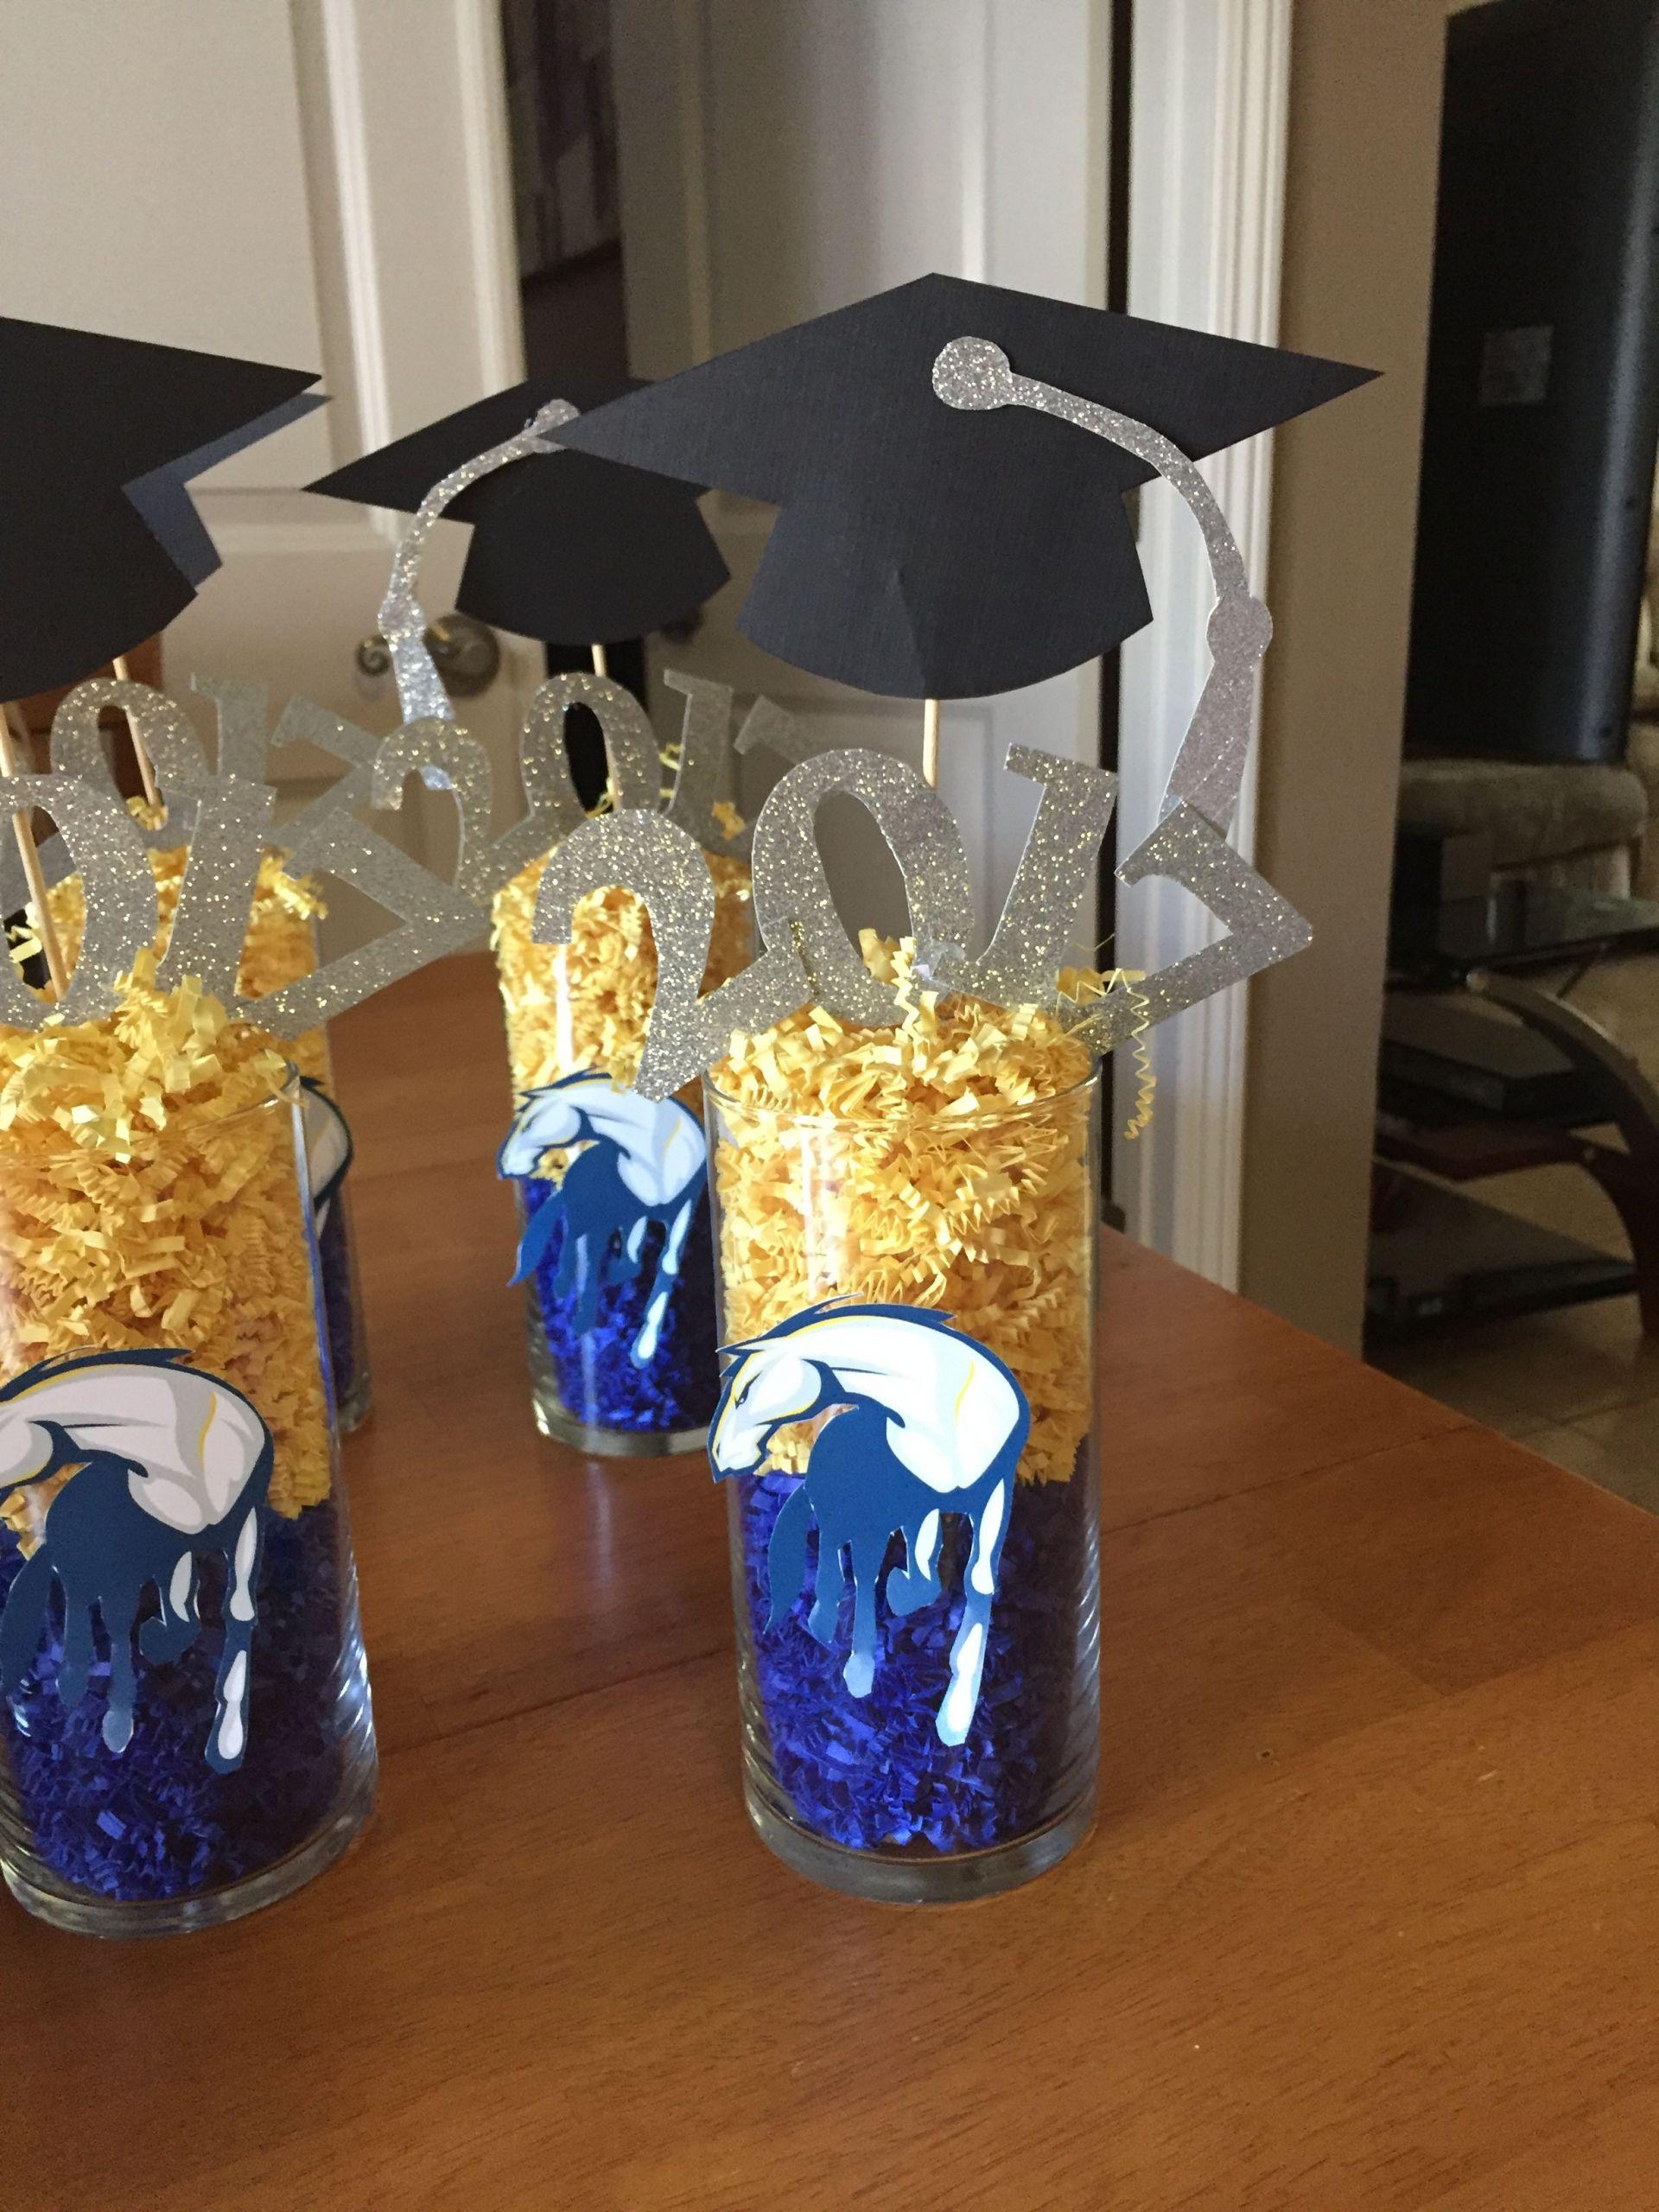 Graduation Party Centerpiece Ideas  UC Davis graduation centerpiece With images